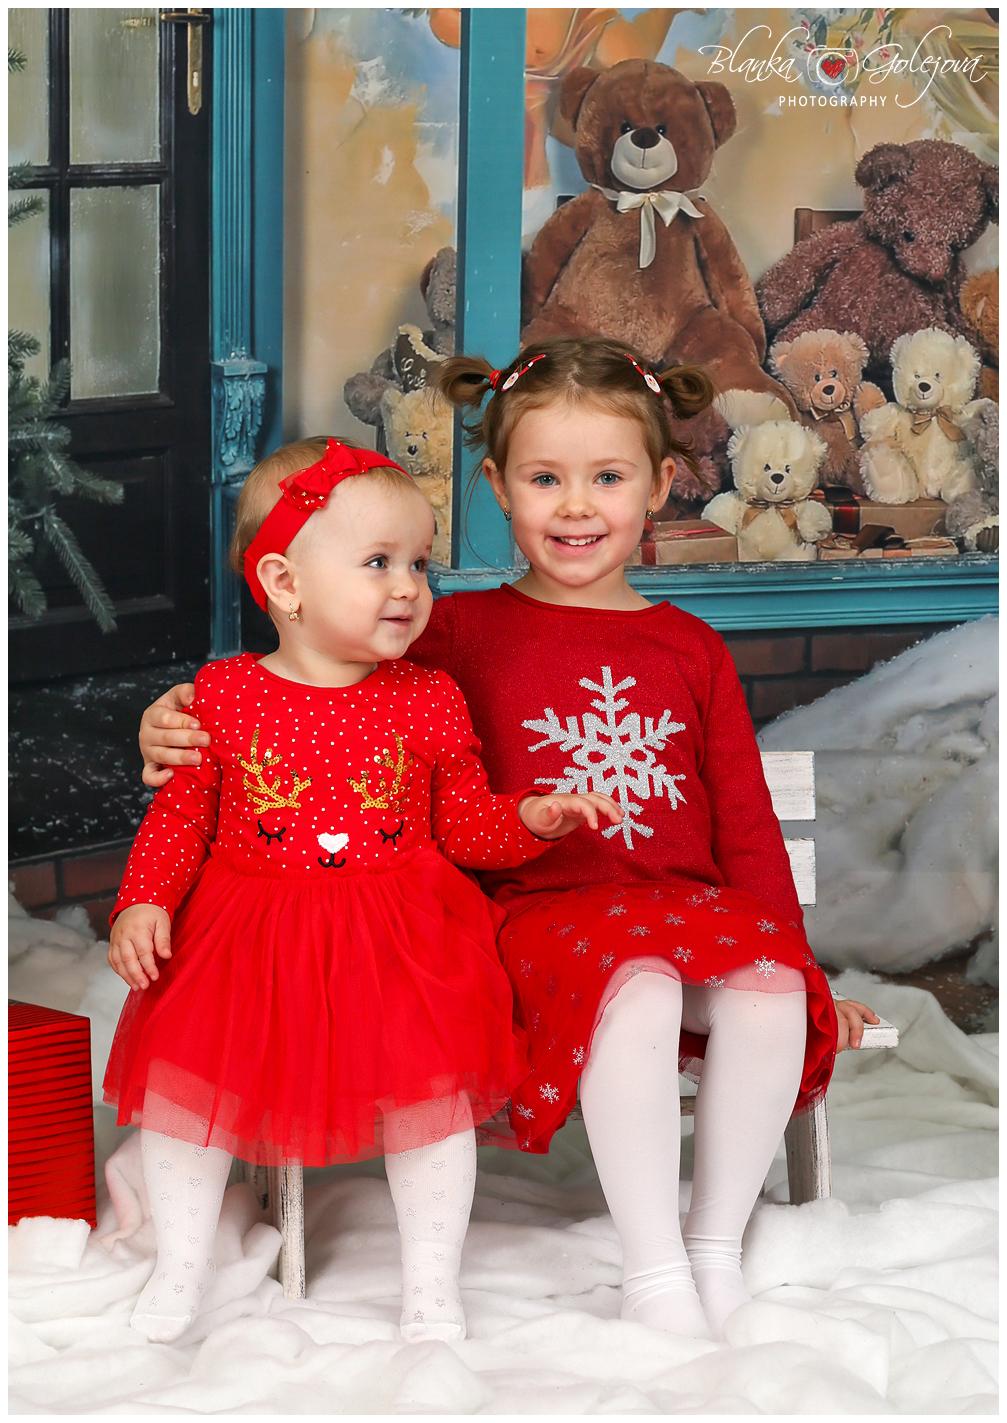 Vianocne fotky s detmi